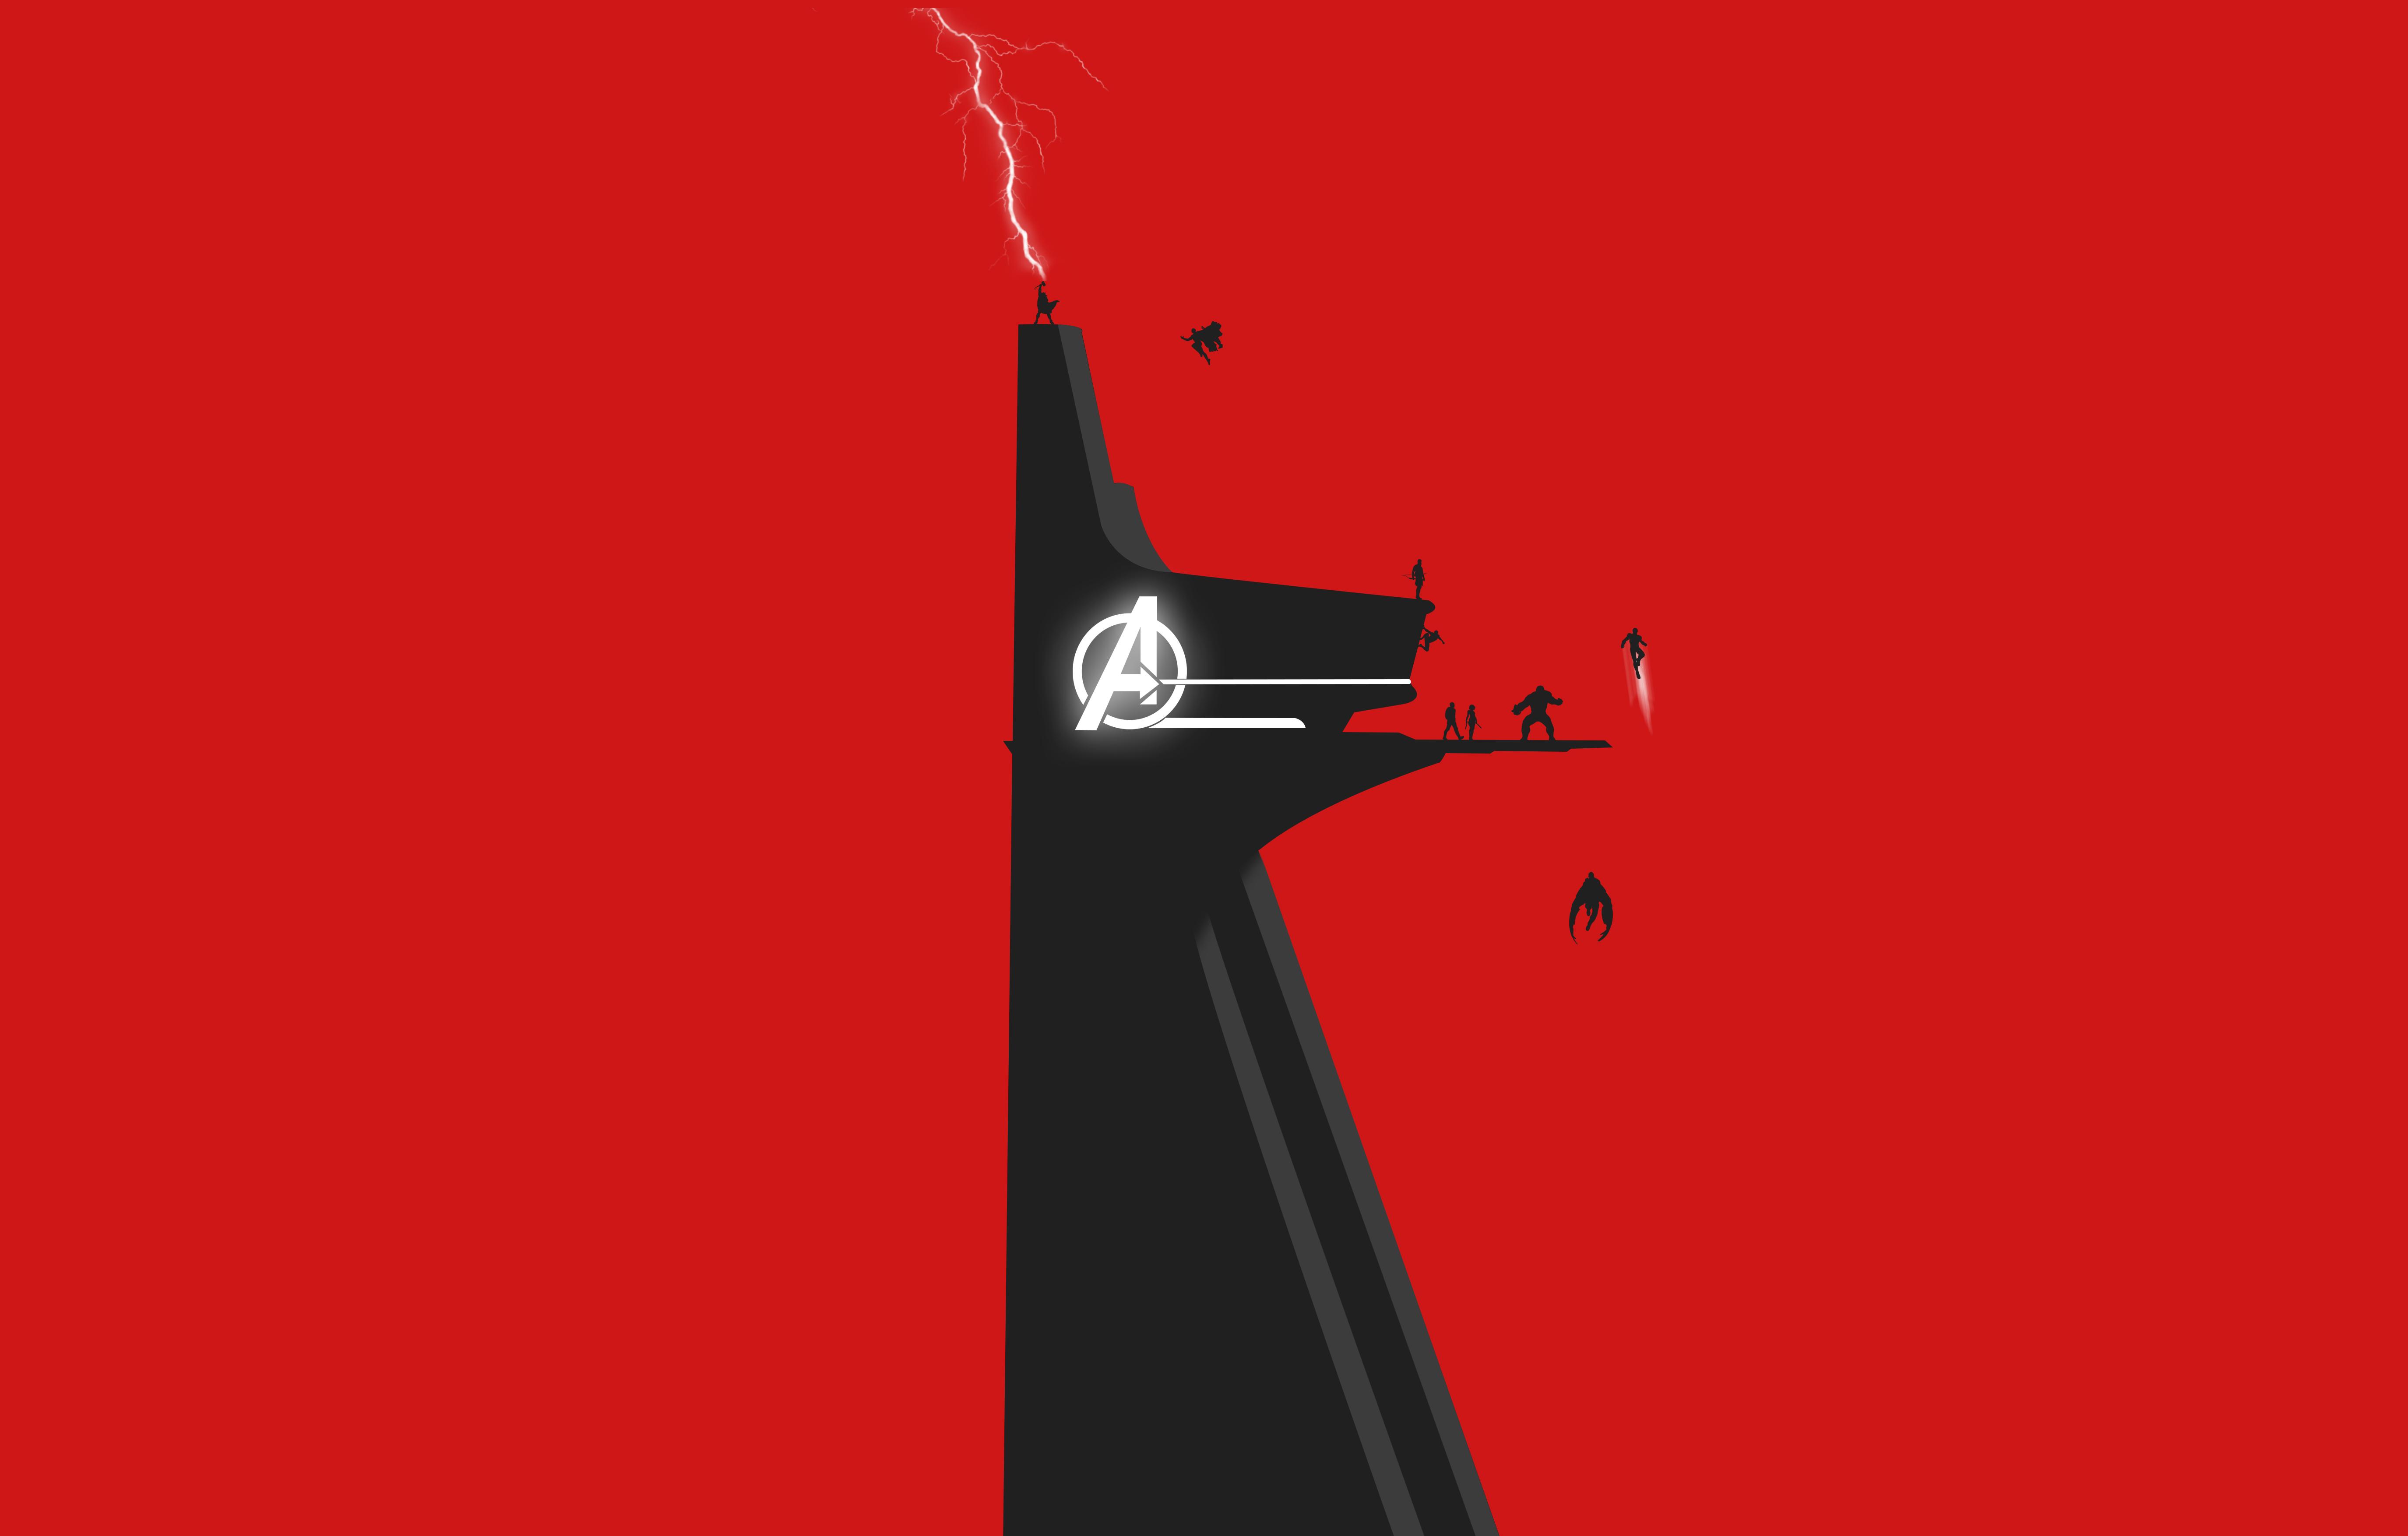 Avengers Stark Tower 5k Hd Superheroes 4k Wallpapers Images